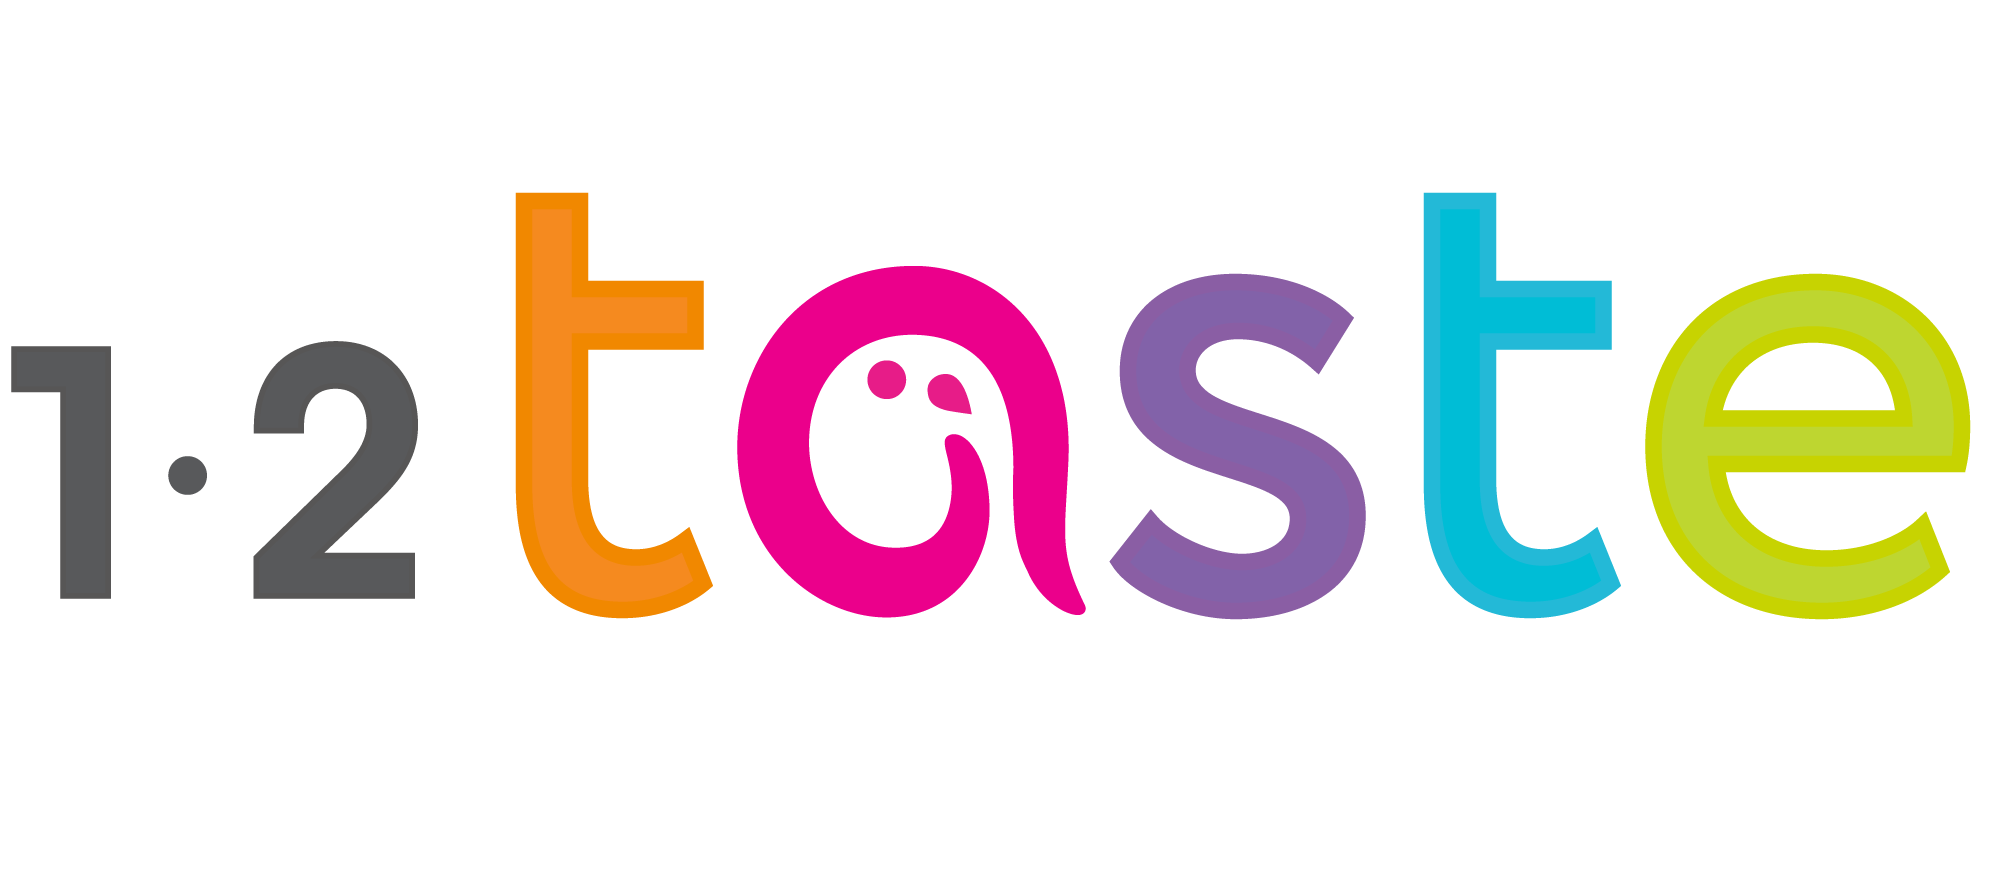 12Taste-logo-29-9-2019-RGB